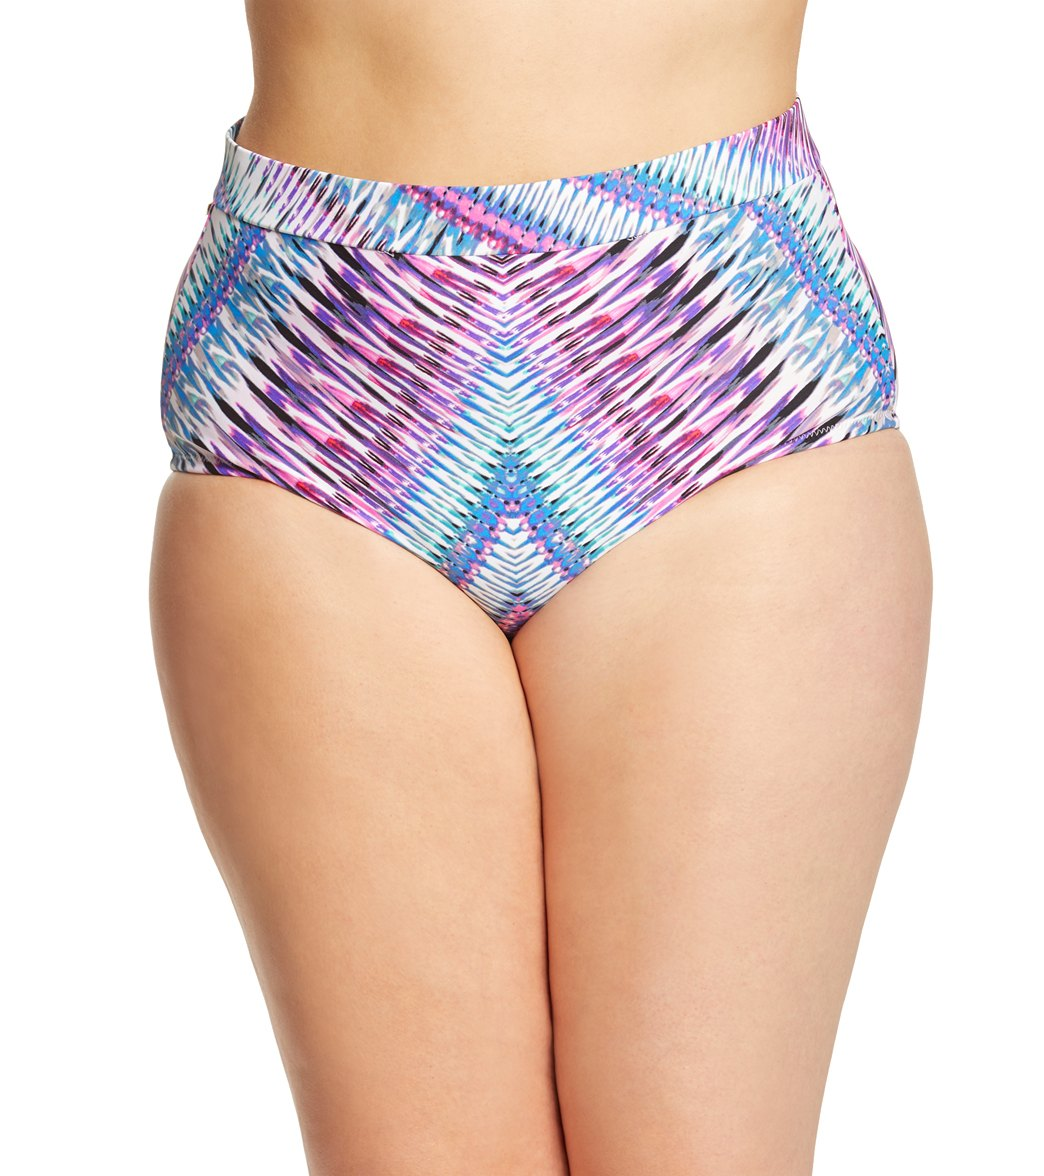 5f3239a8266 Raisins Curve Plus Size Stolen Heart Island High Waist Bikini Bottom at  SwimOutlet.com